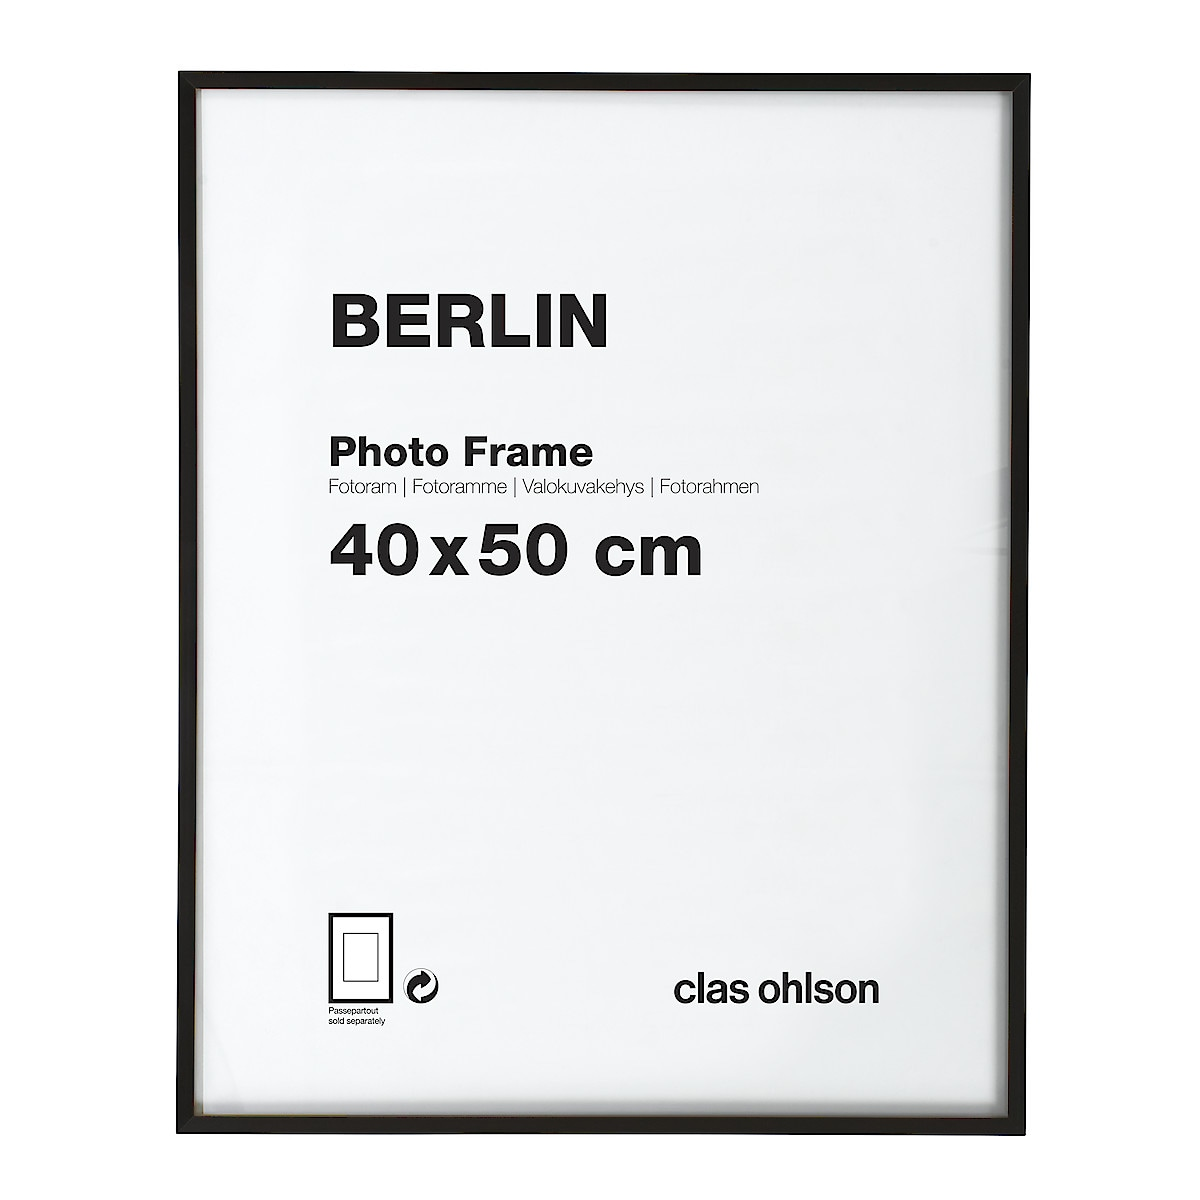 Berlin Photo Frame, black